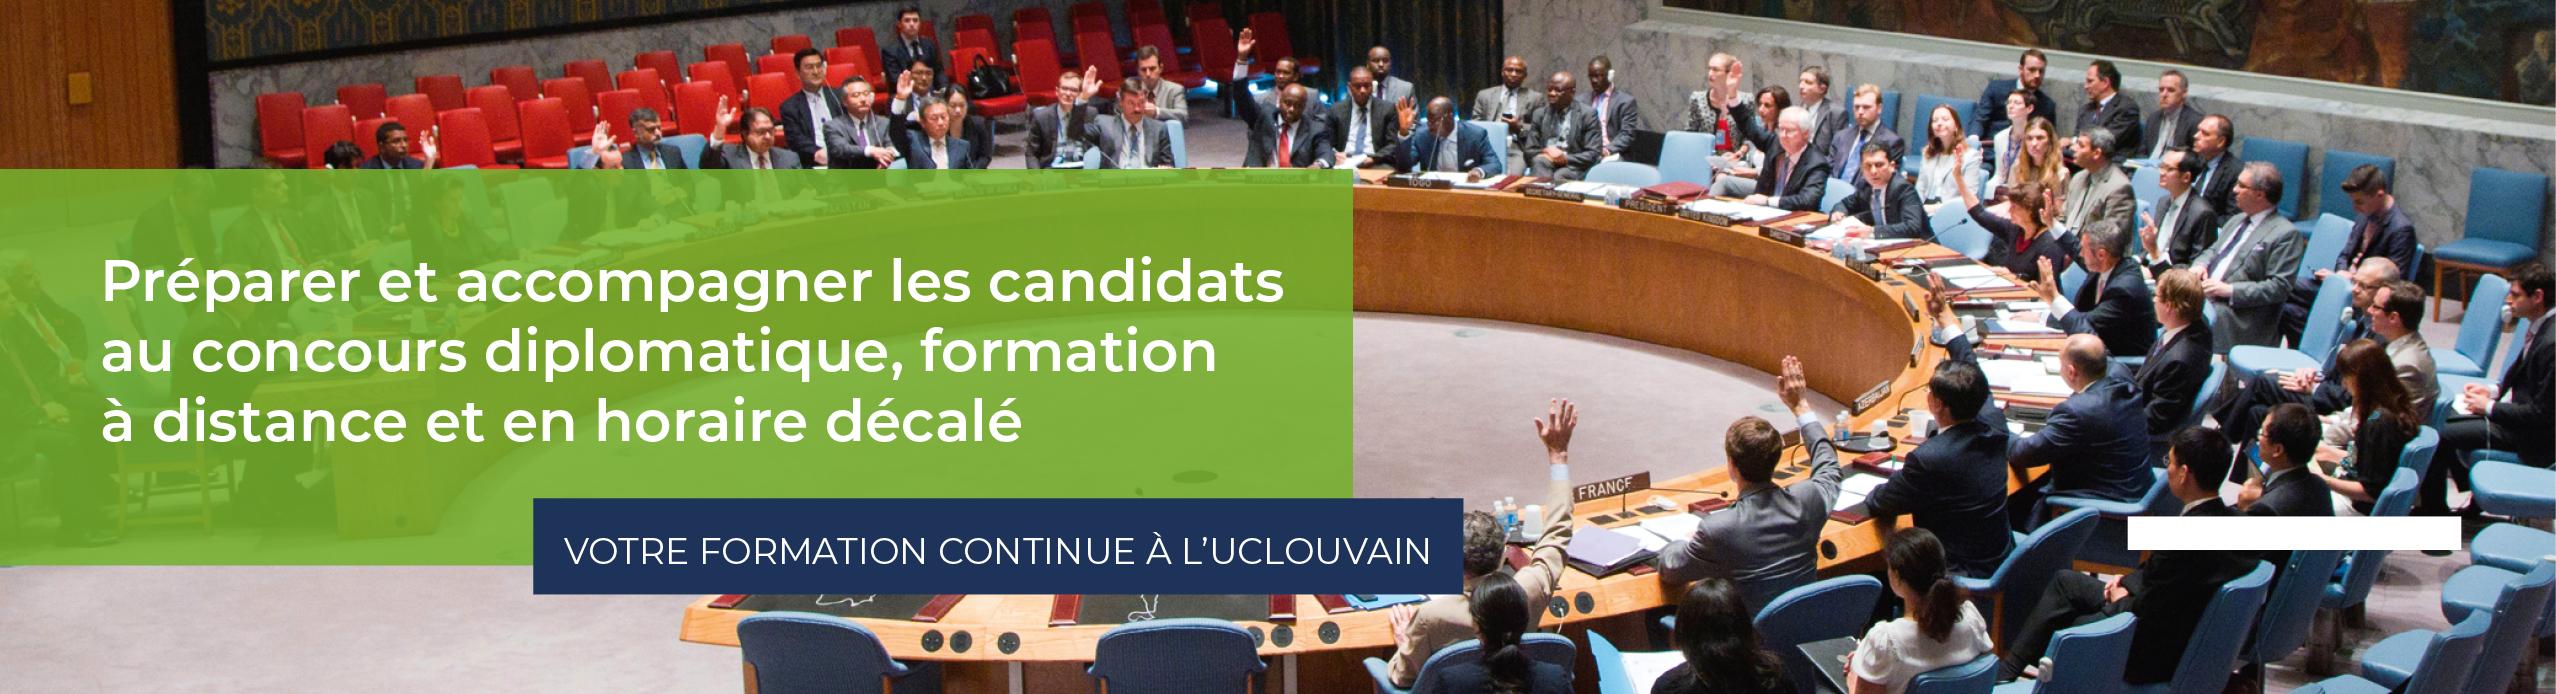 ConcoursDiplomatique_Header_Homepage.jpg